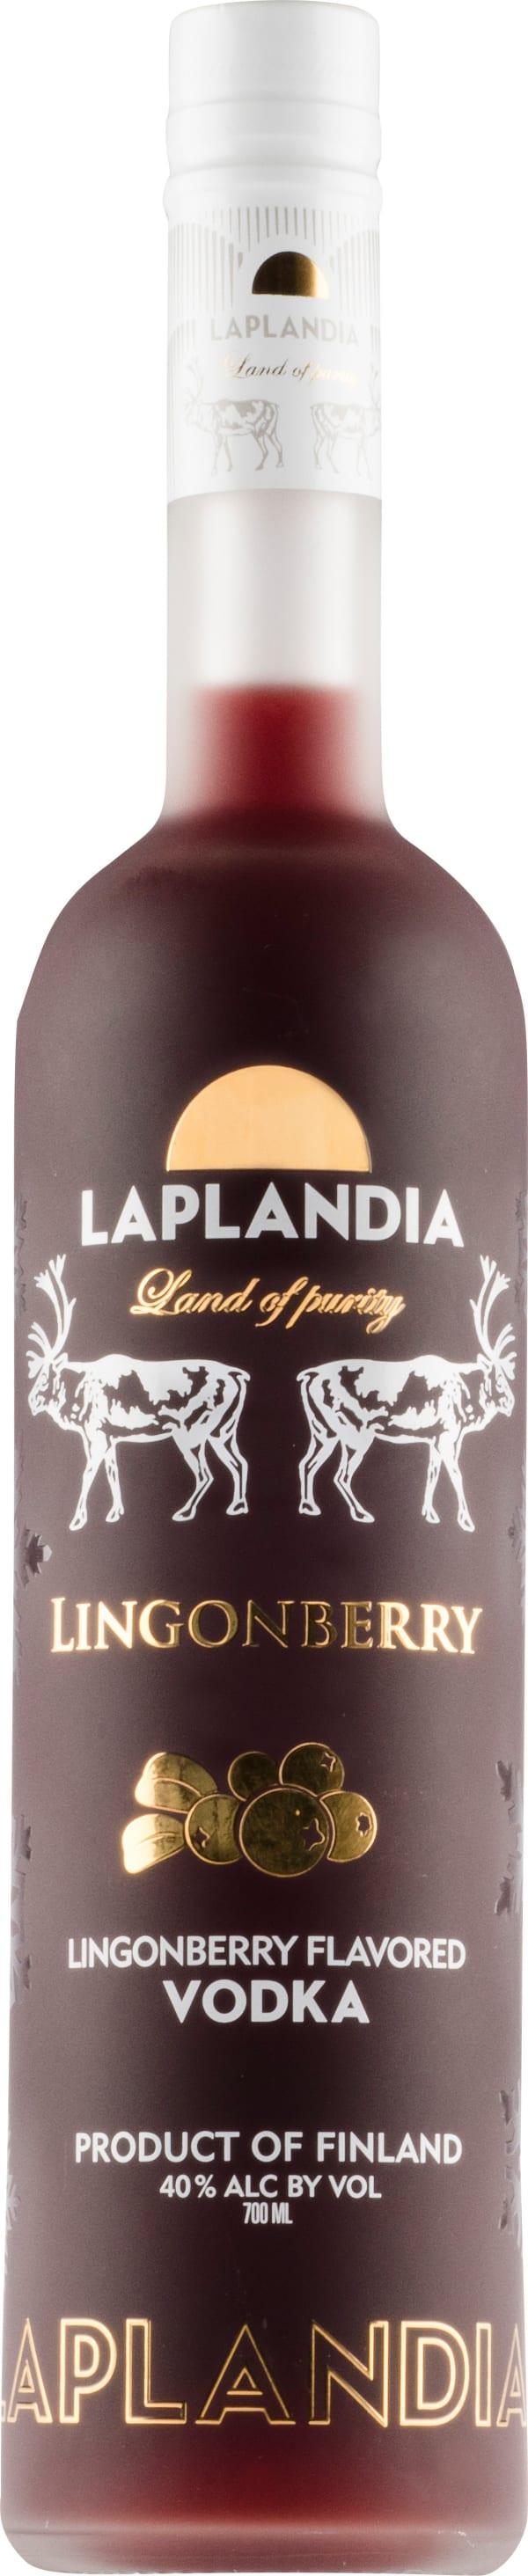 Laplandia Lingonberry Vodka